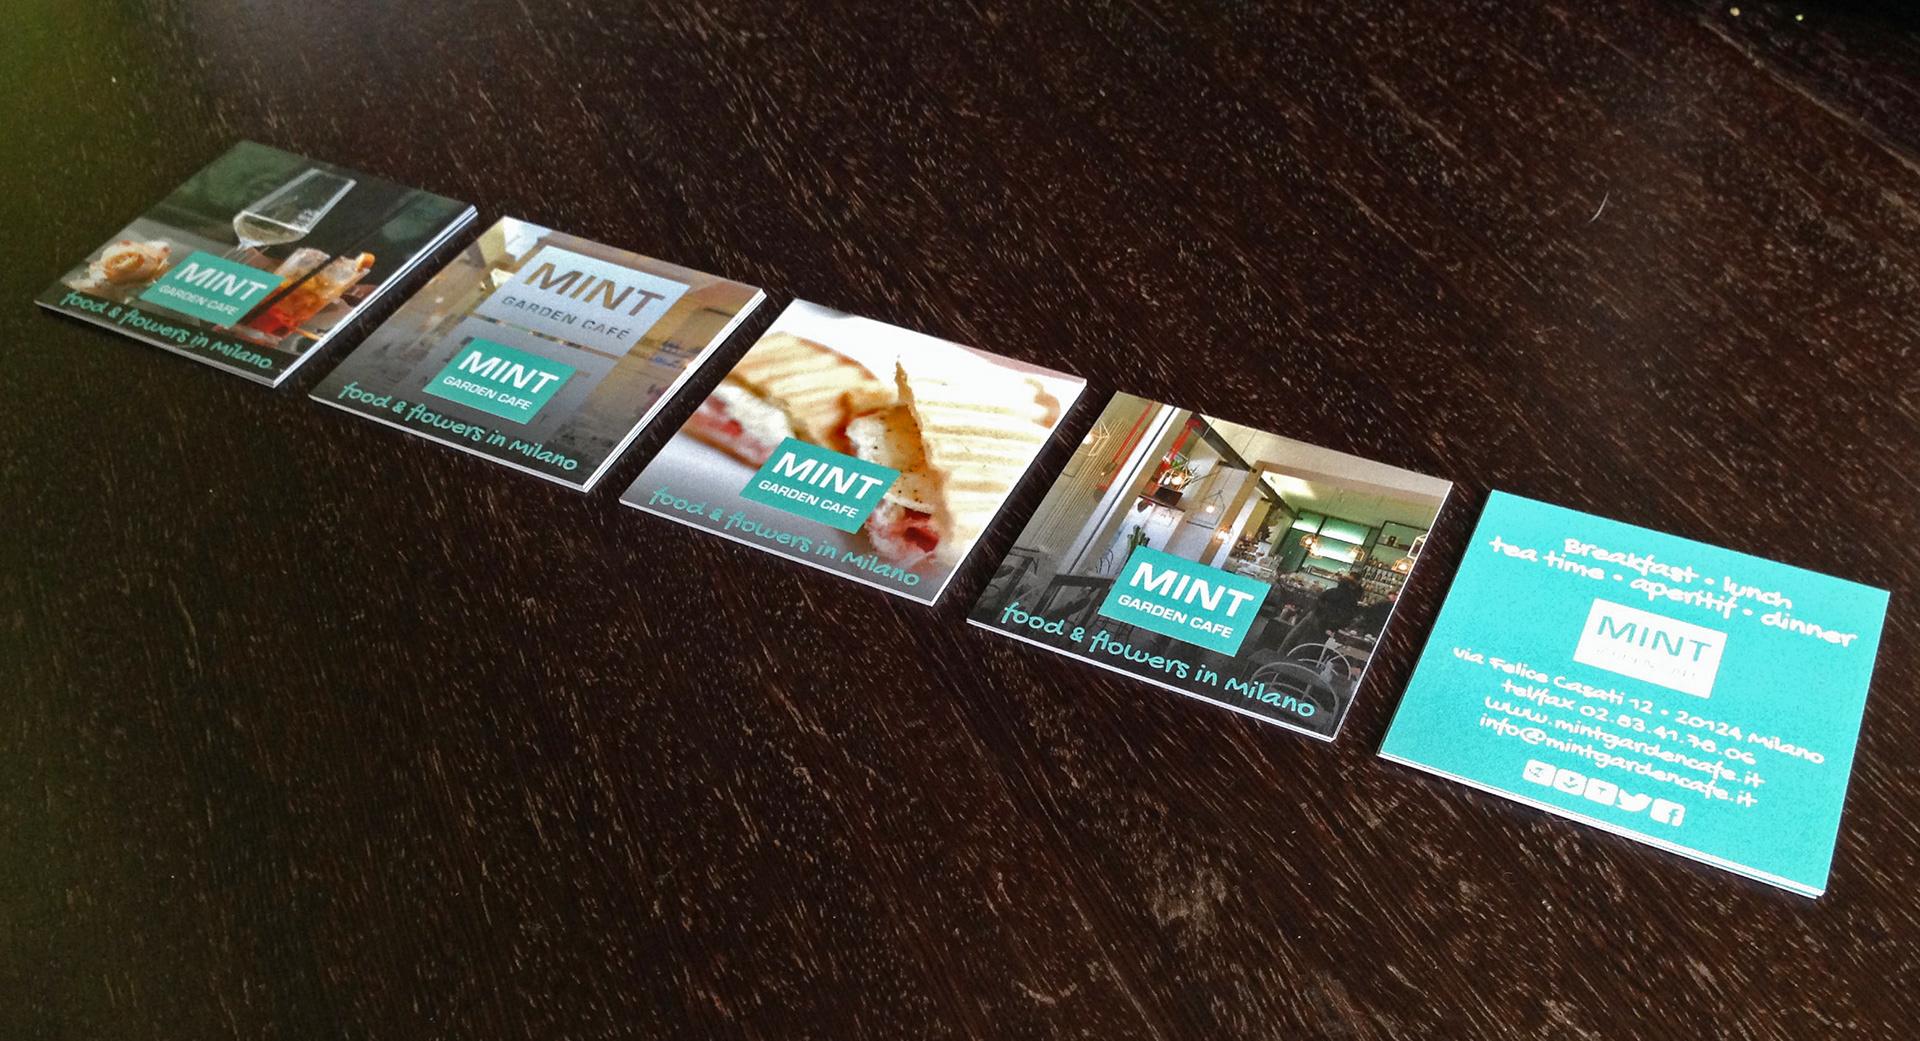 Raffaella isidori portfolio mint garden caf milano it mint garden caf milano business cards 2014 magicingreecefo Image collections